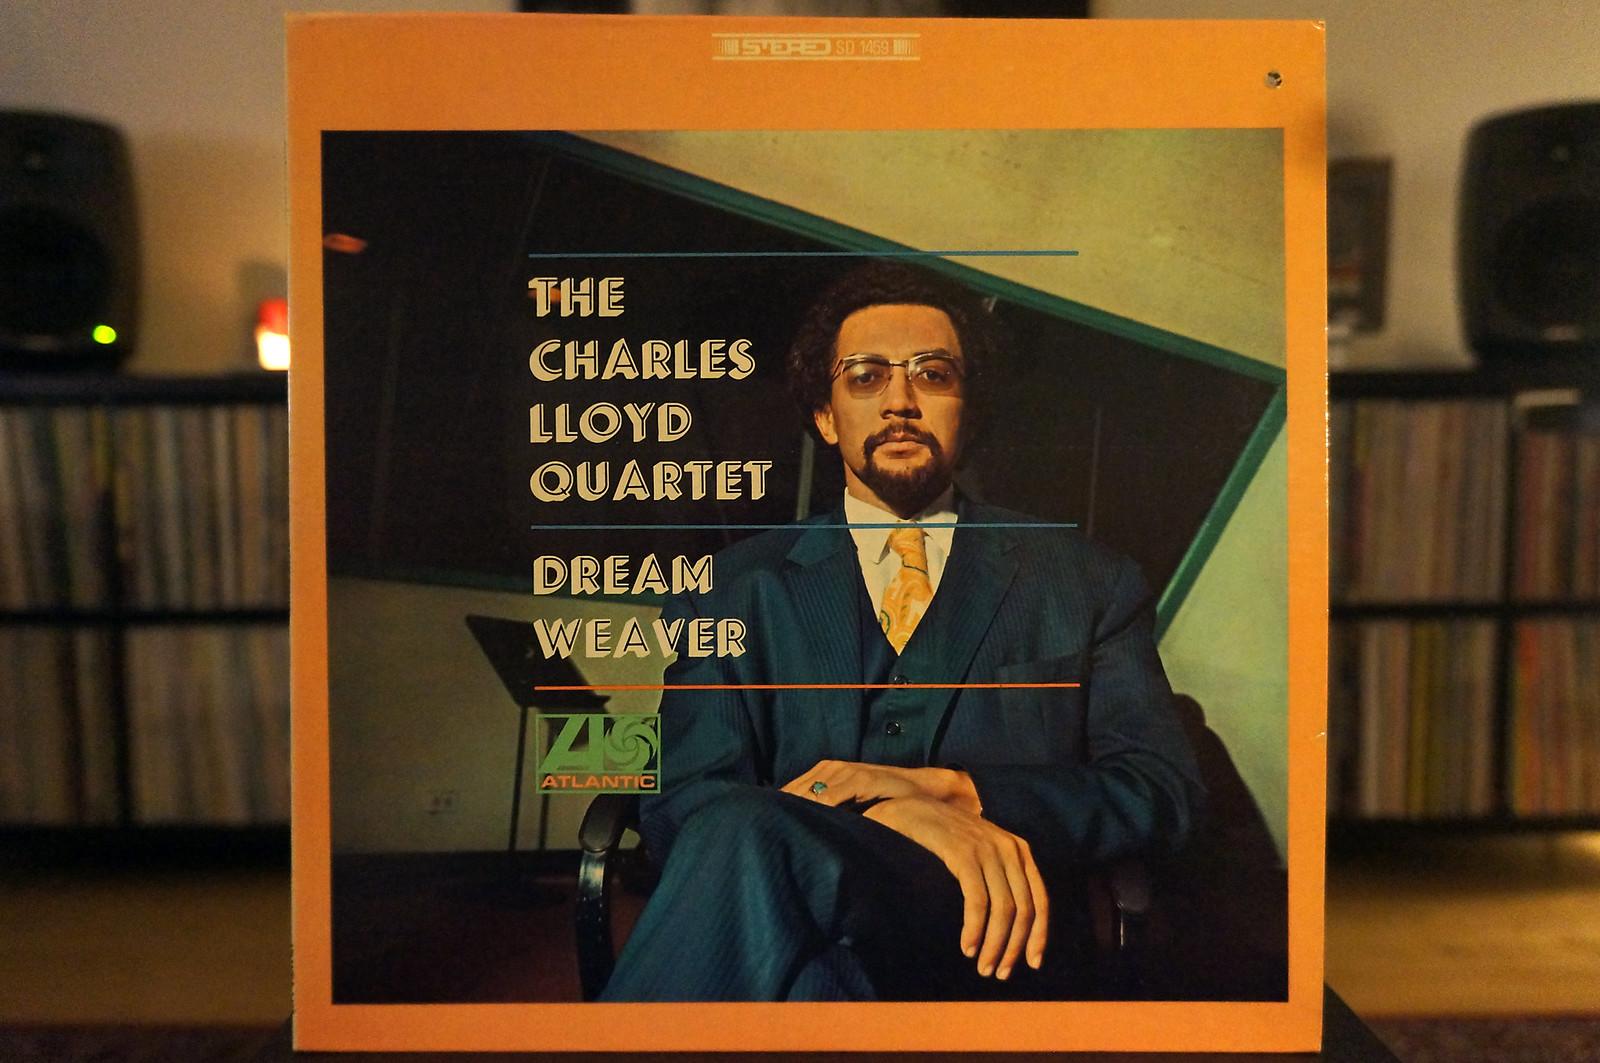 The Charles Lloyd Quartet - Dream Weaver LP